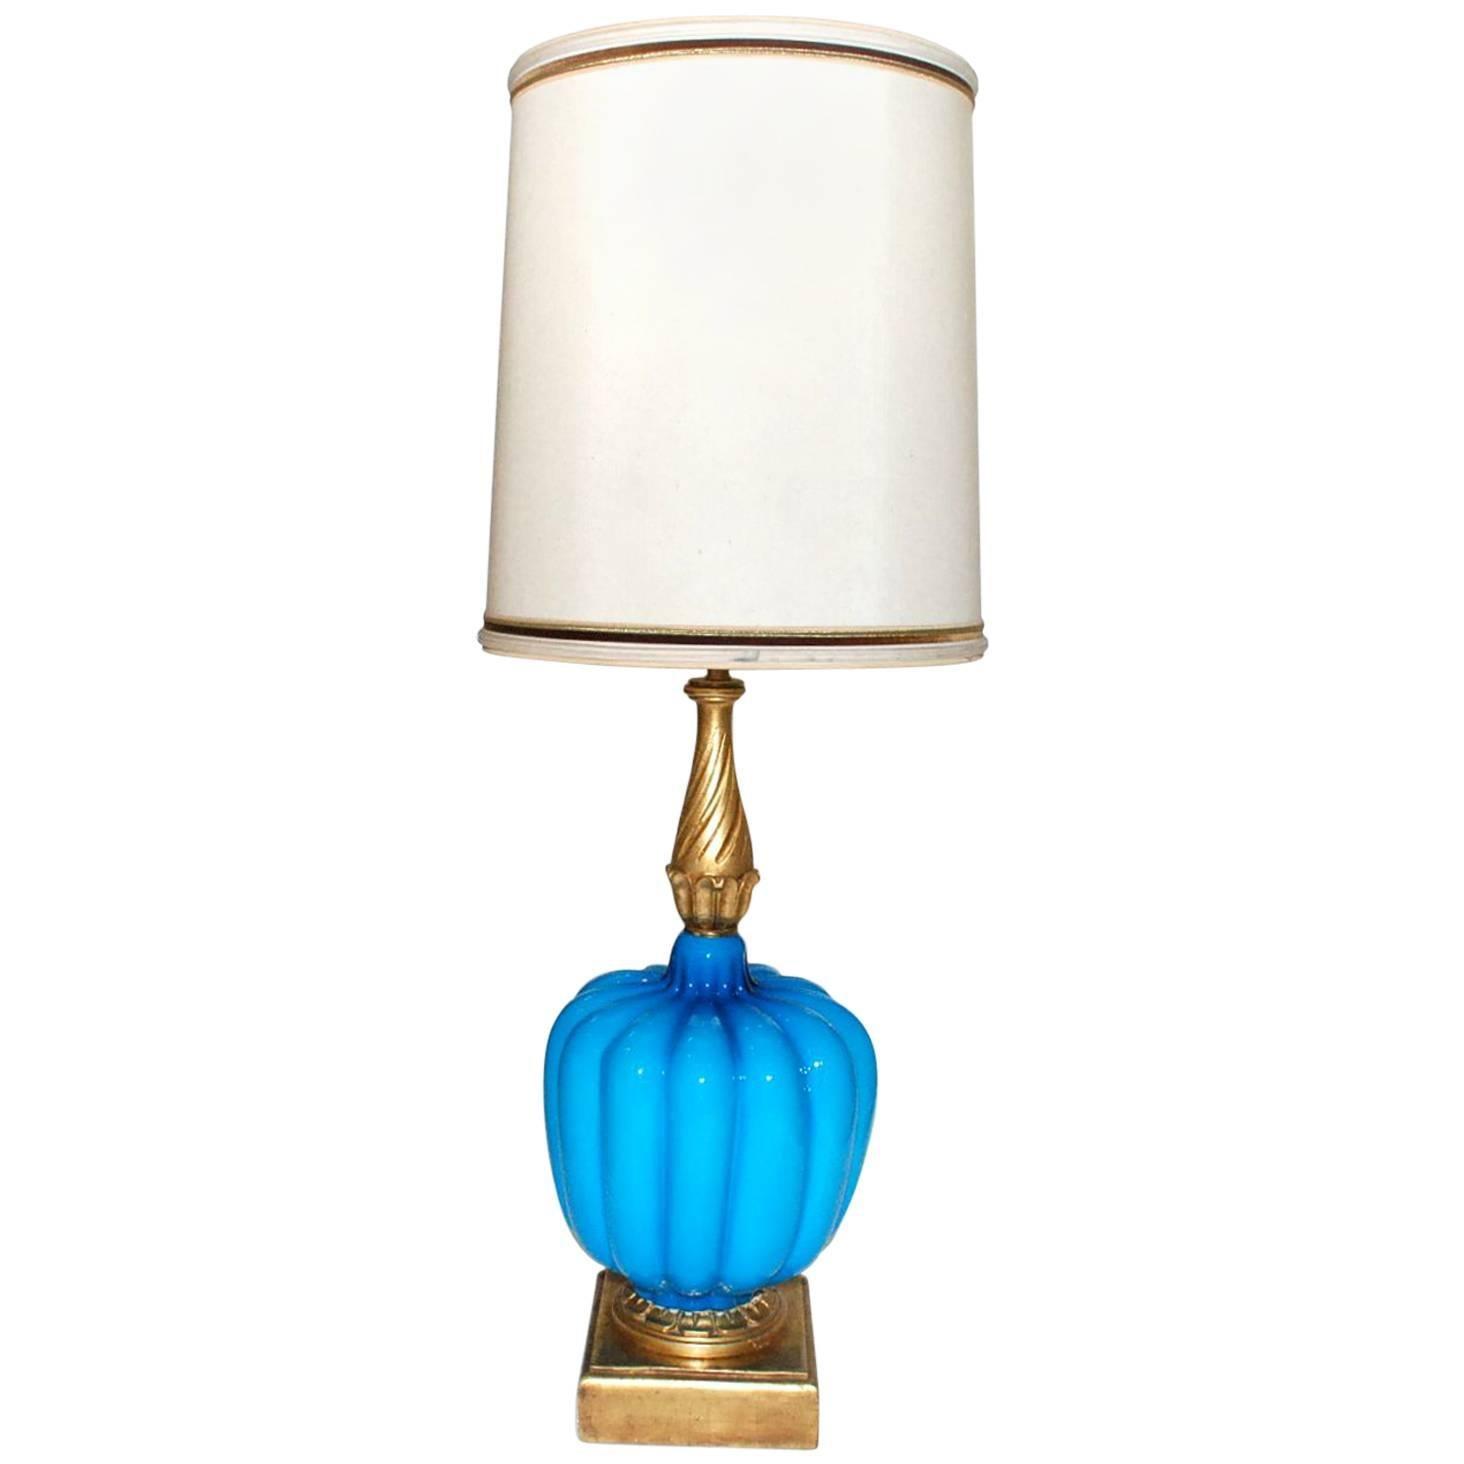 Italian Turquoise Murano Table Lamp